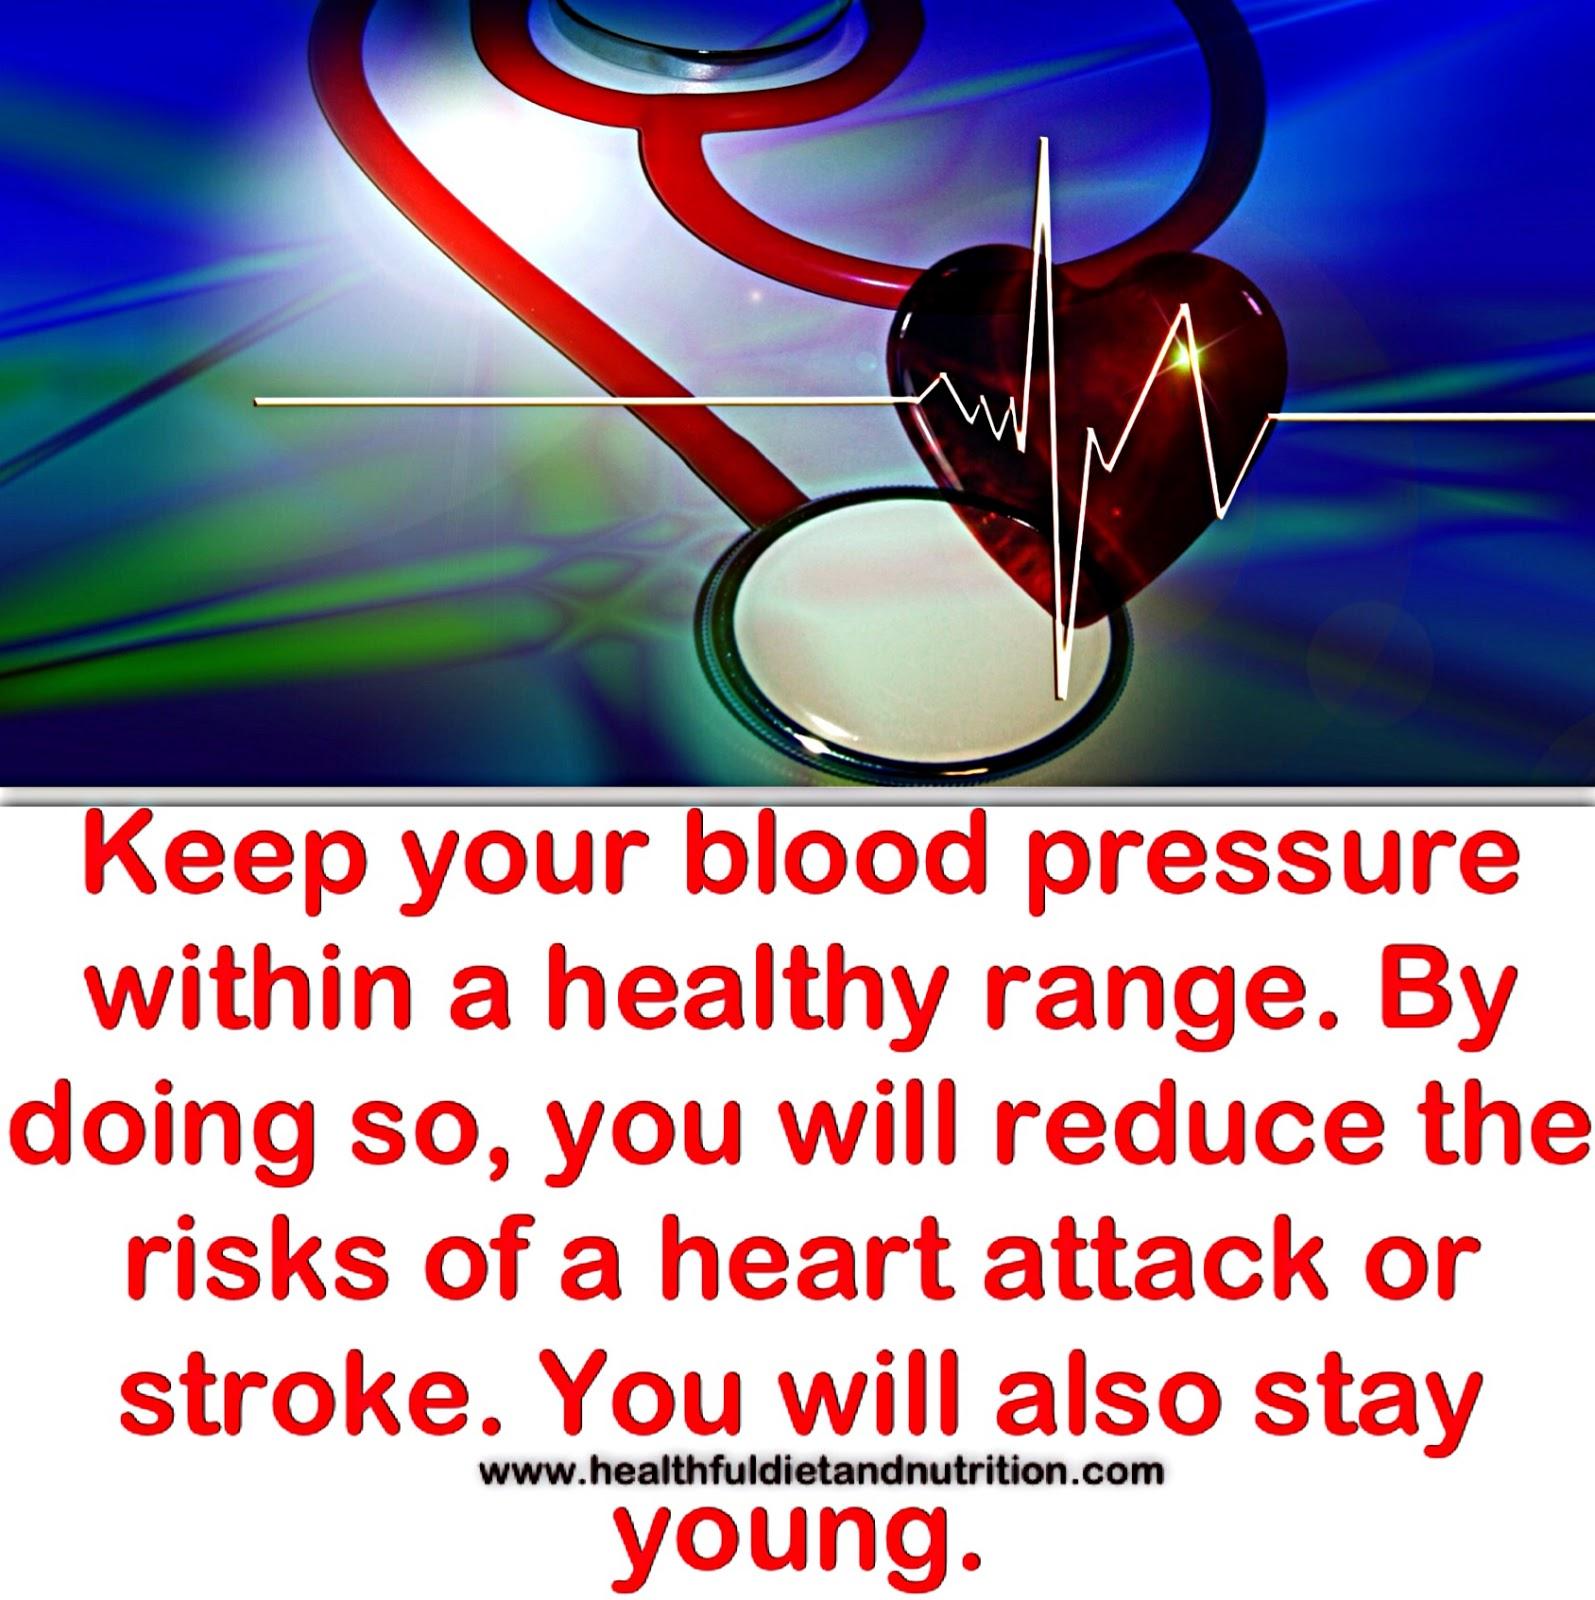 Maintain a Healthy Blood Pressure